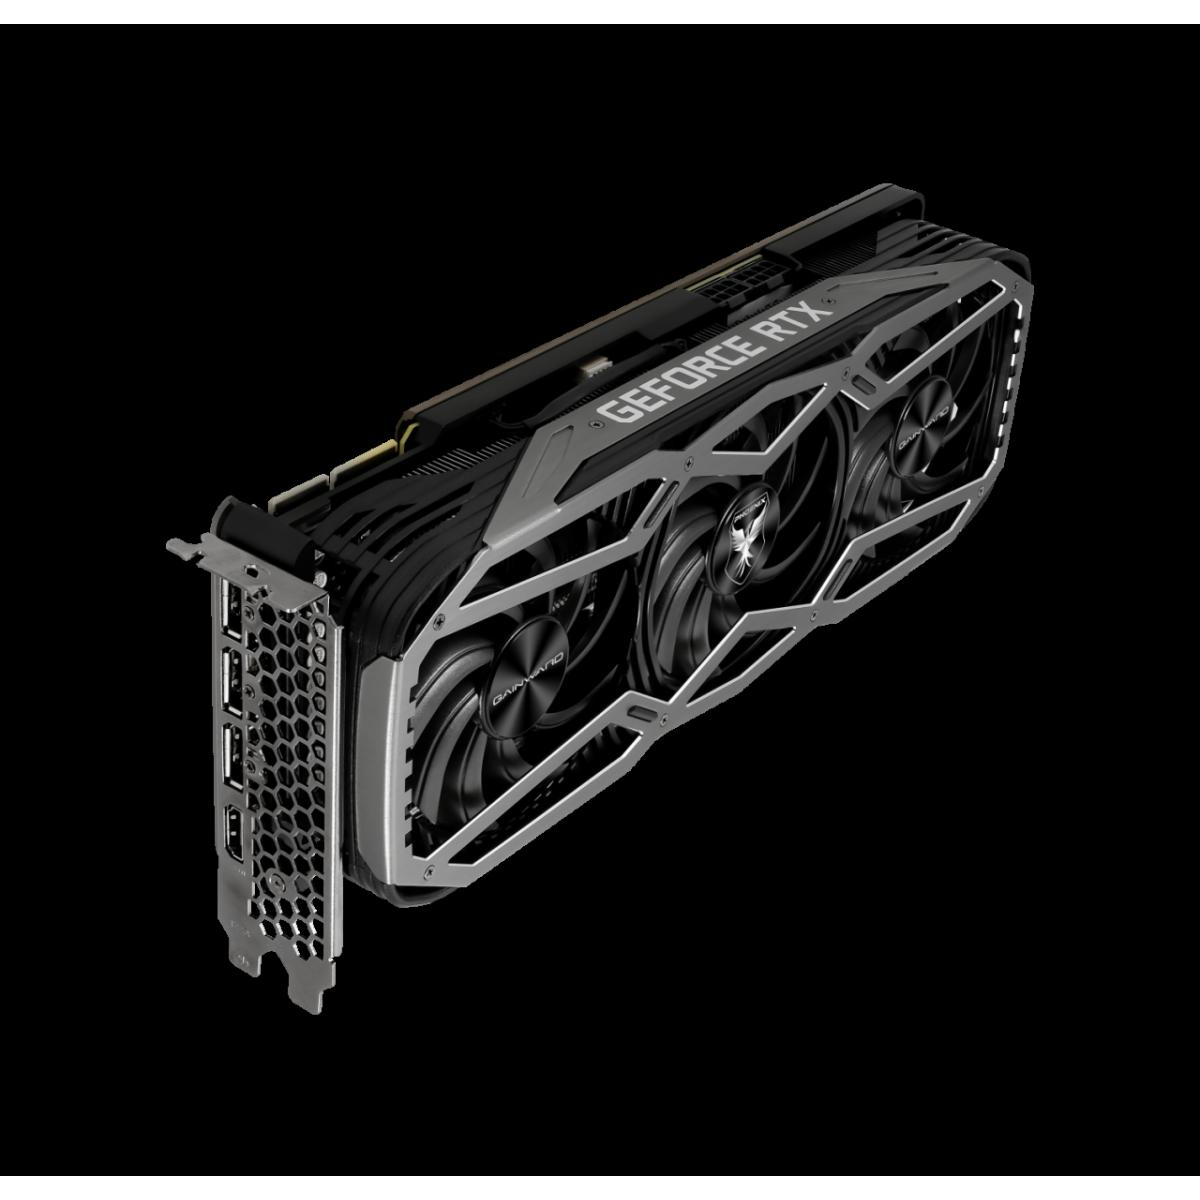 Placa de Vídeo Gainward, GeForce RTX 3070 Phoenix GS, 8GB, GDDR6, 256Bit